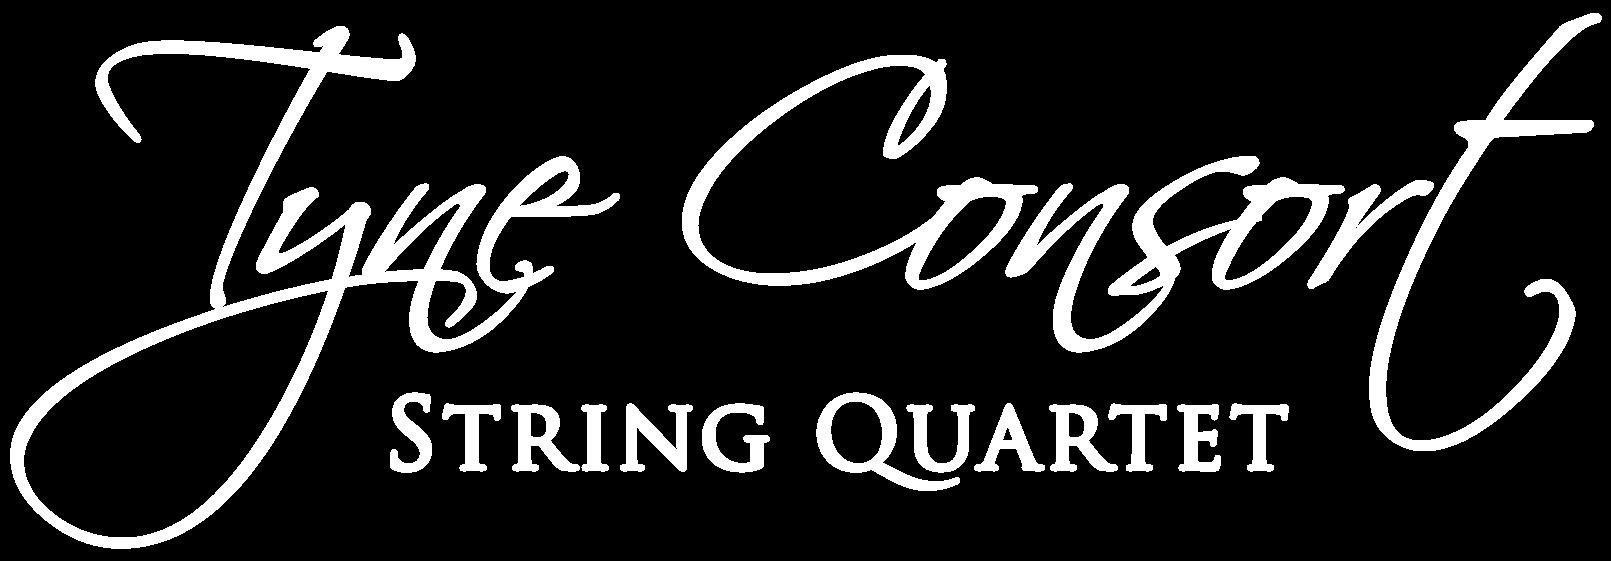 Tyne Consort